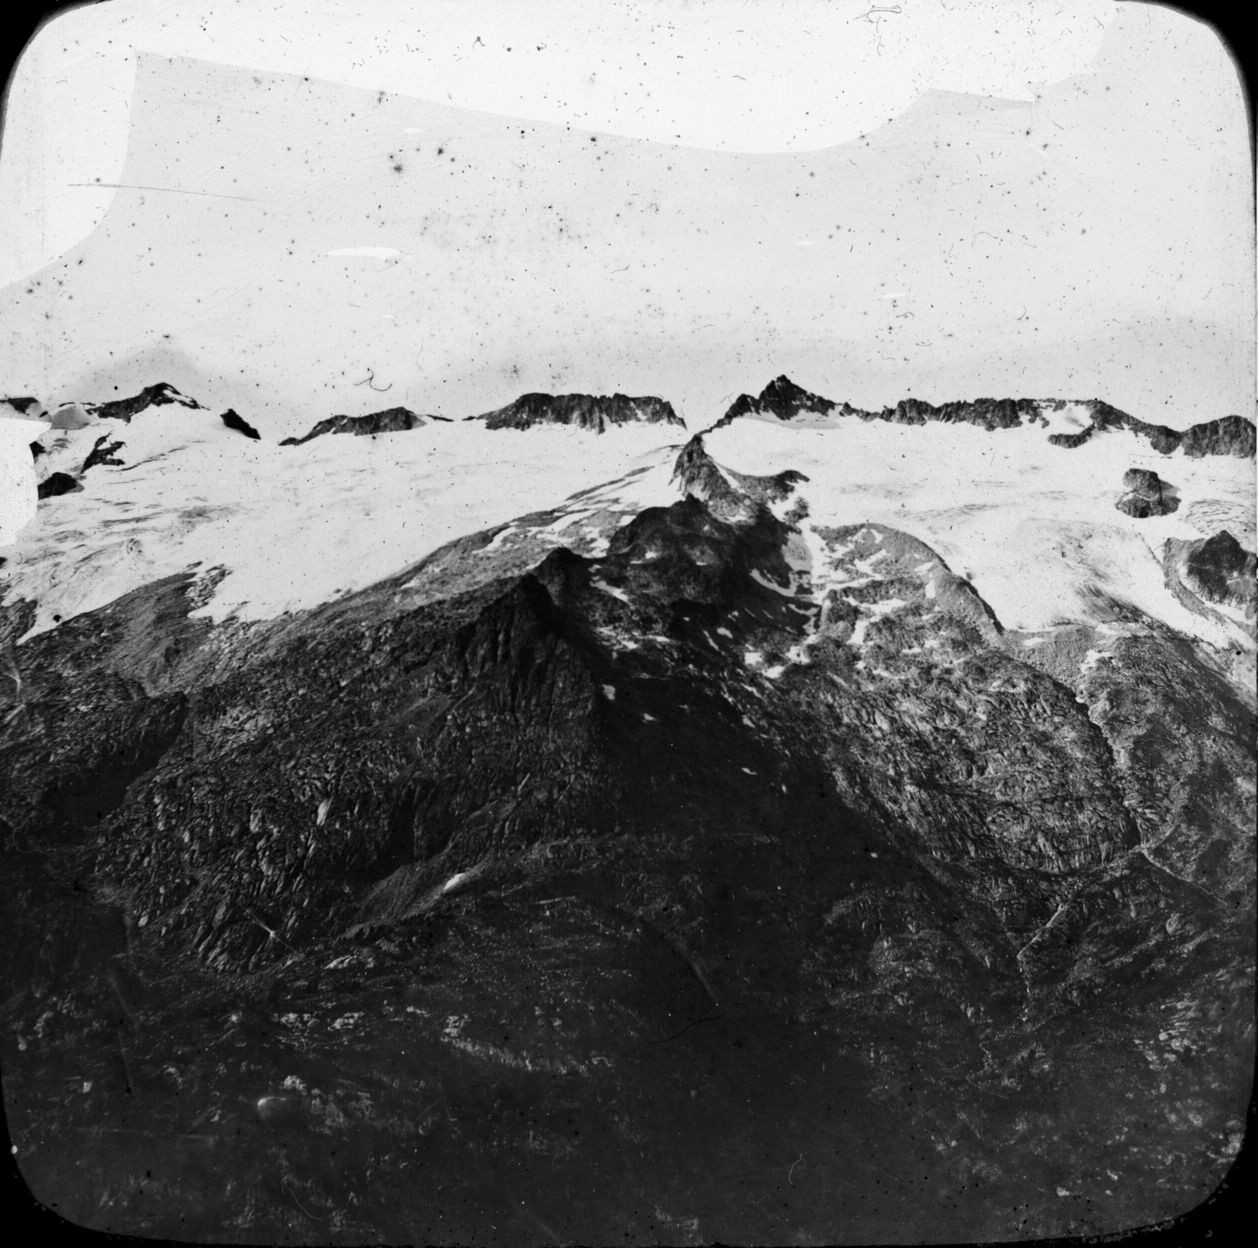 Glaciers de la Maladeta et de l'Aneto en 1895